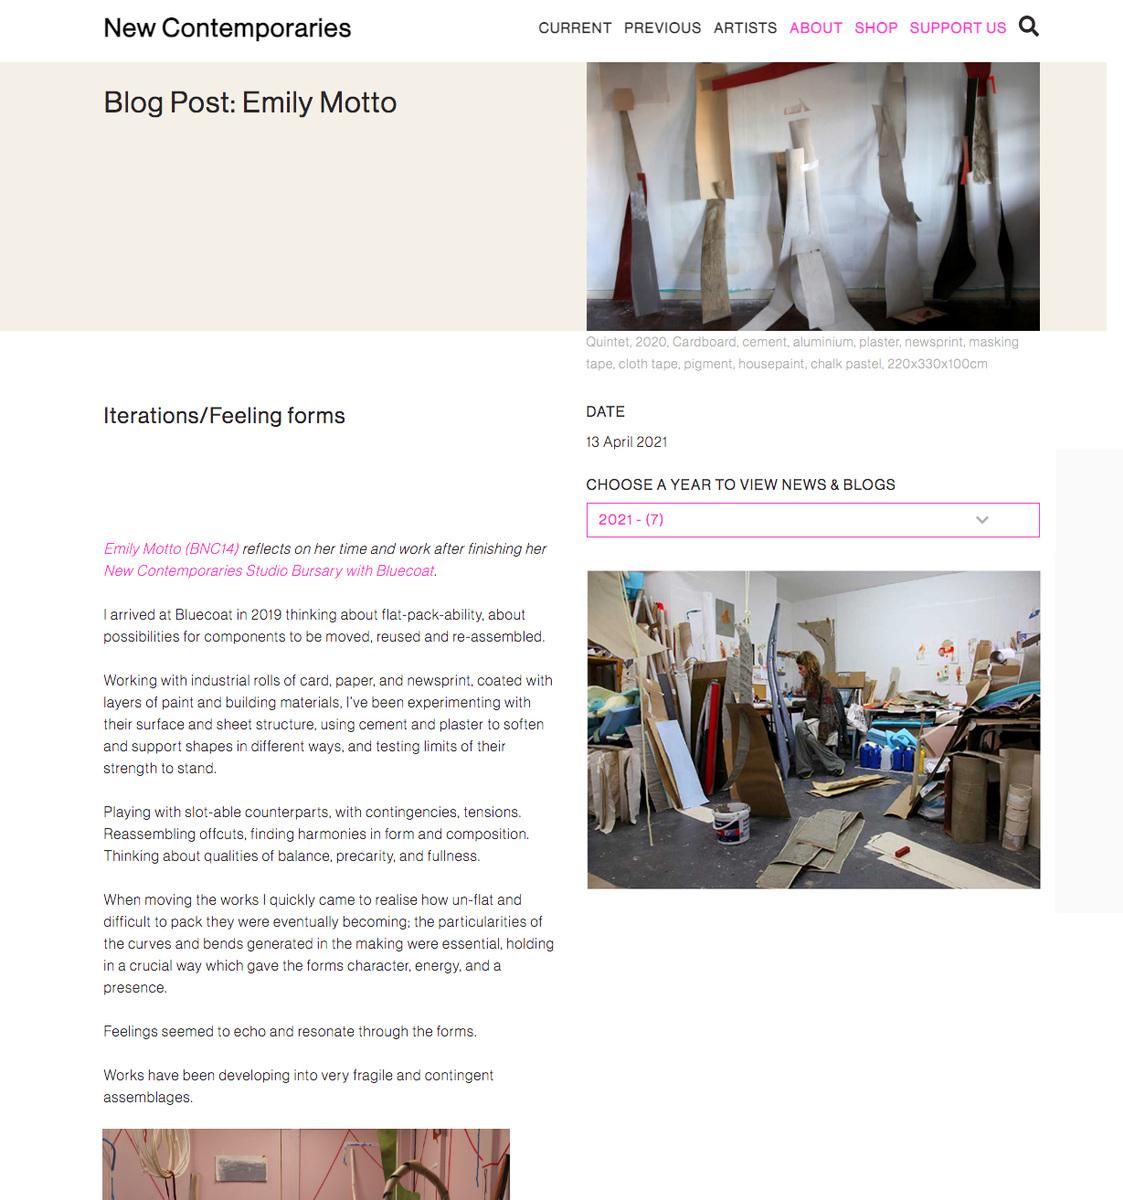 Emily Motto - https://www.newcontemporaries.org.uk/news/blog-post-emily-motto1